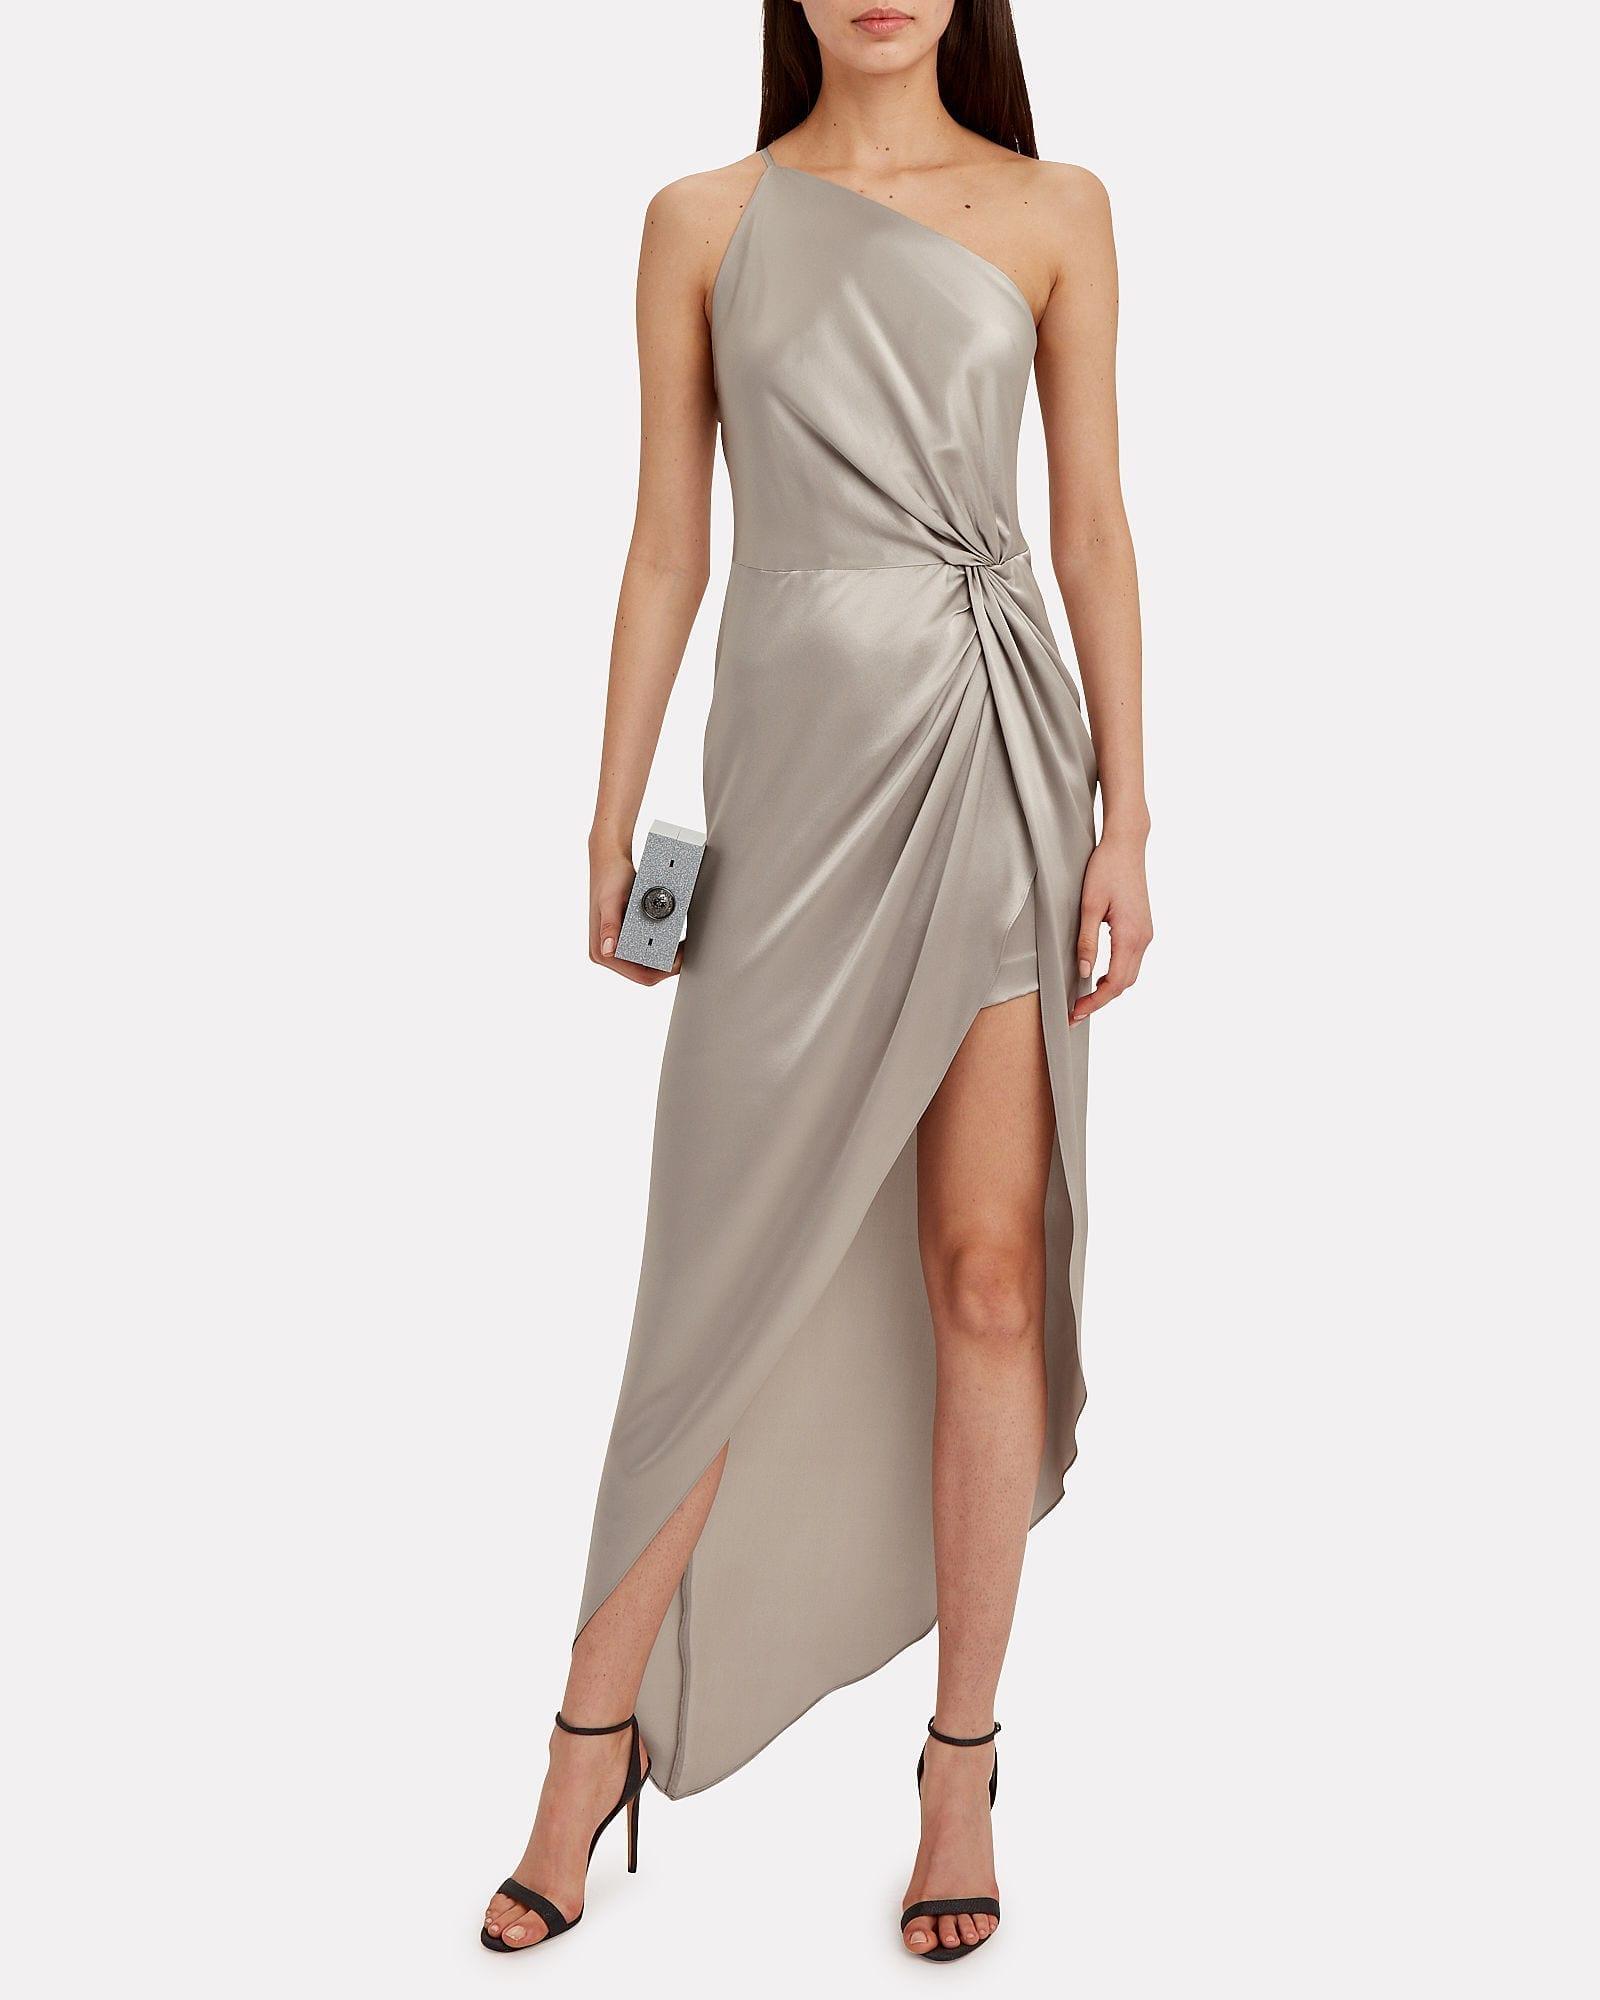 MICHELLE MASON Twist Knot One Shoulder Silver Dress